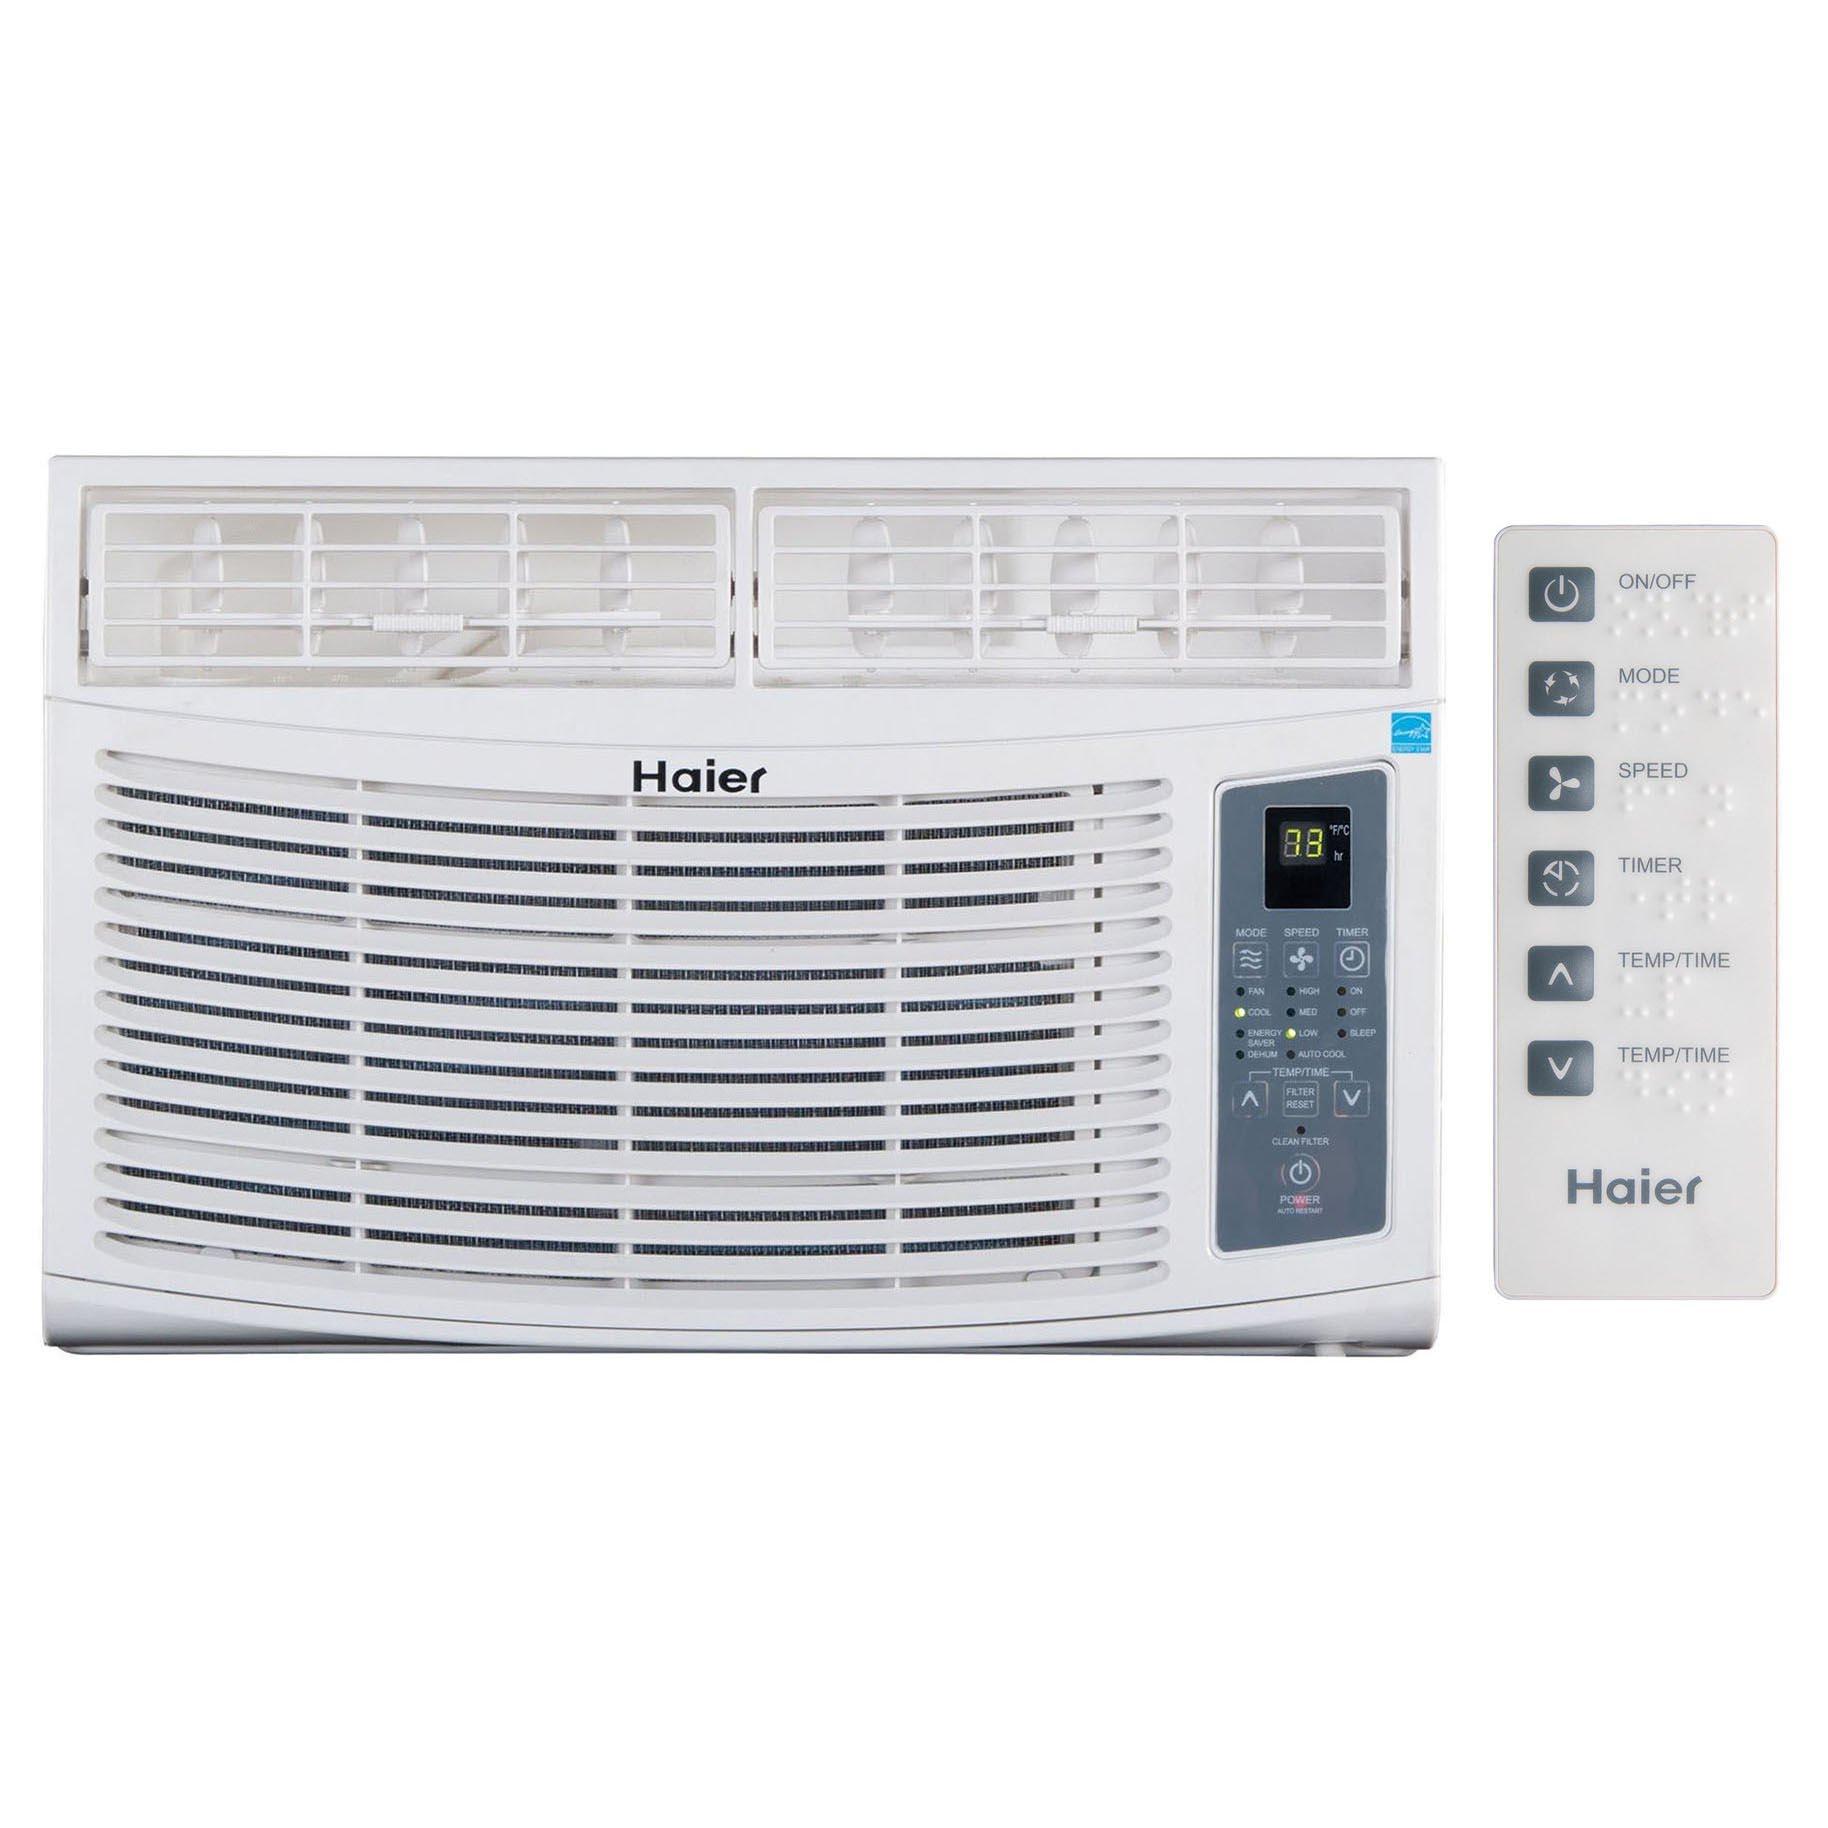 haier ac unit. haier esa406n 6,000 btu window air conditioner ac unit for 150-250 square feet ac 1